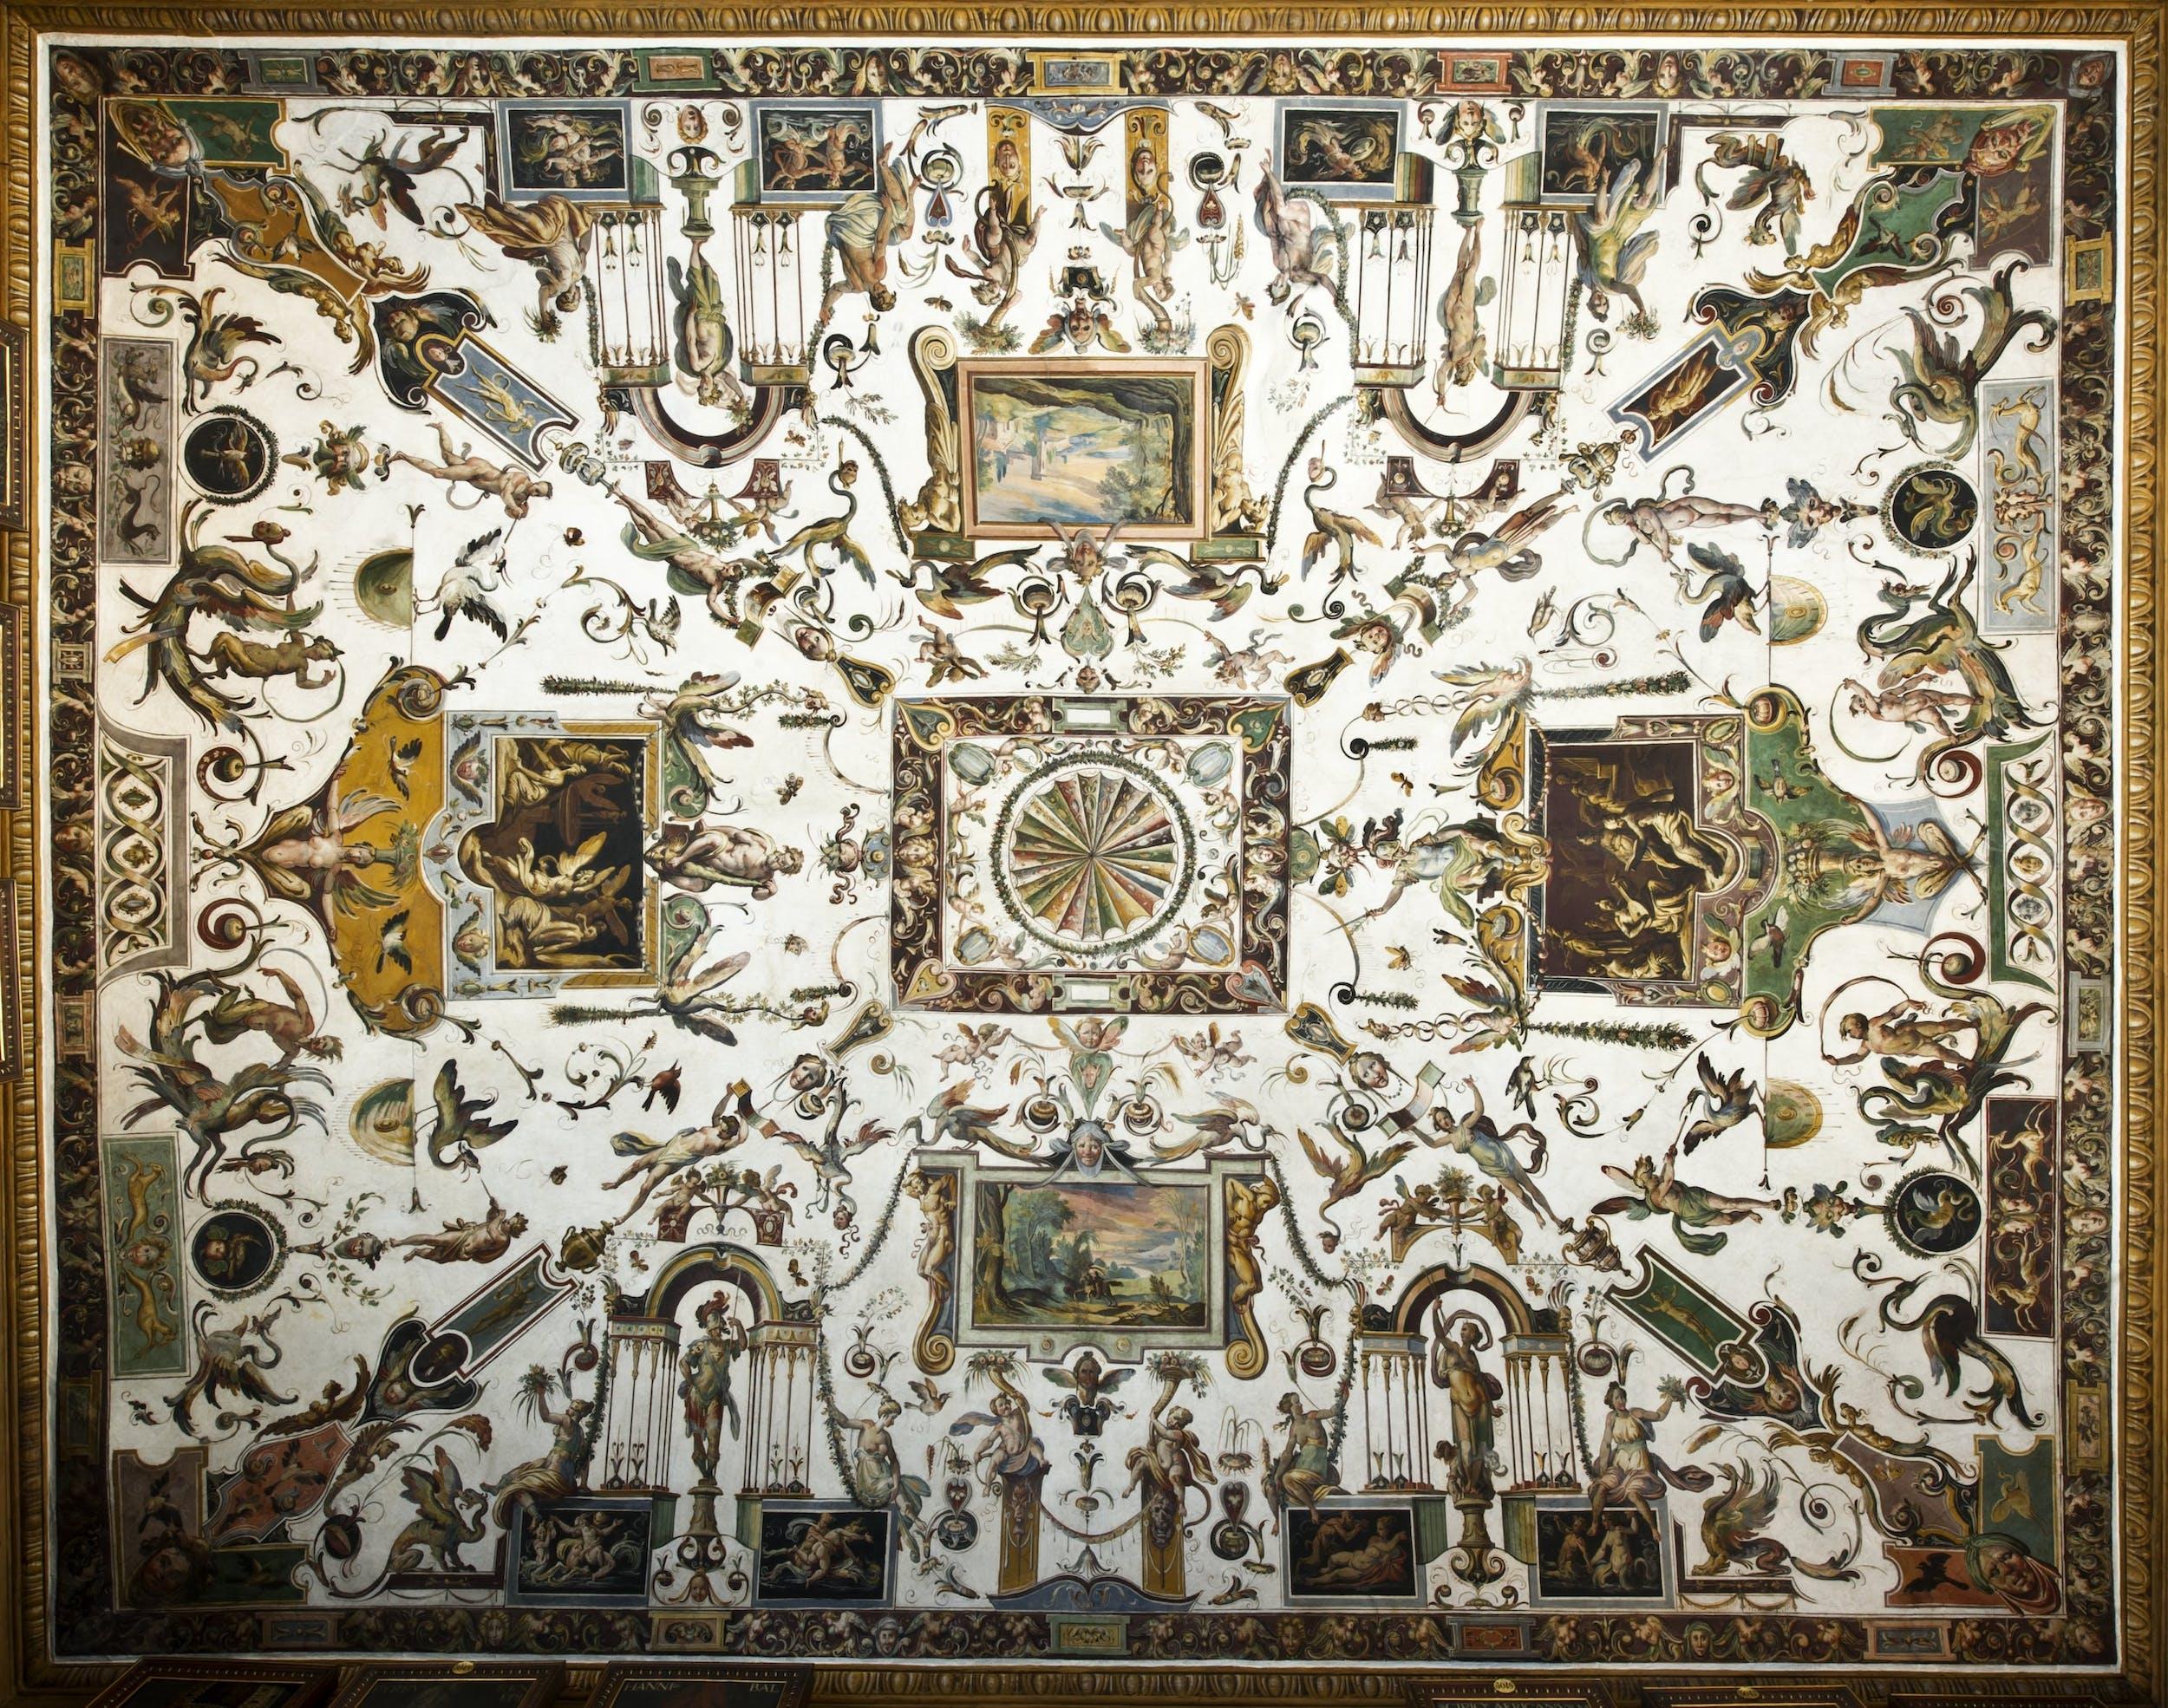 Uffizi, Grottesche